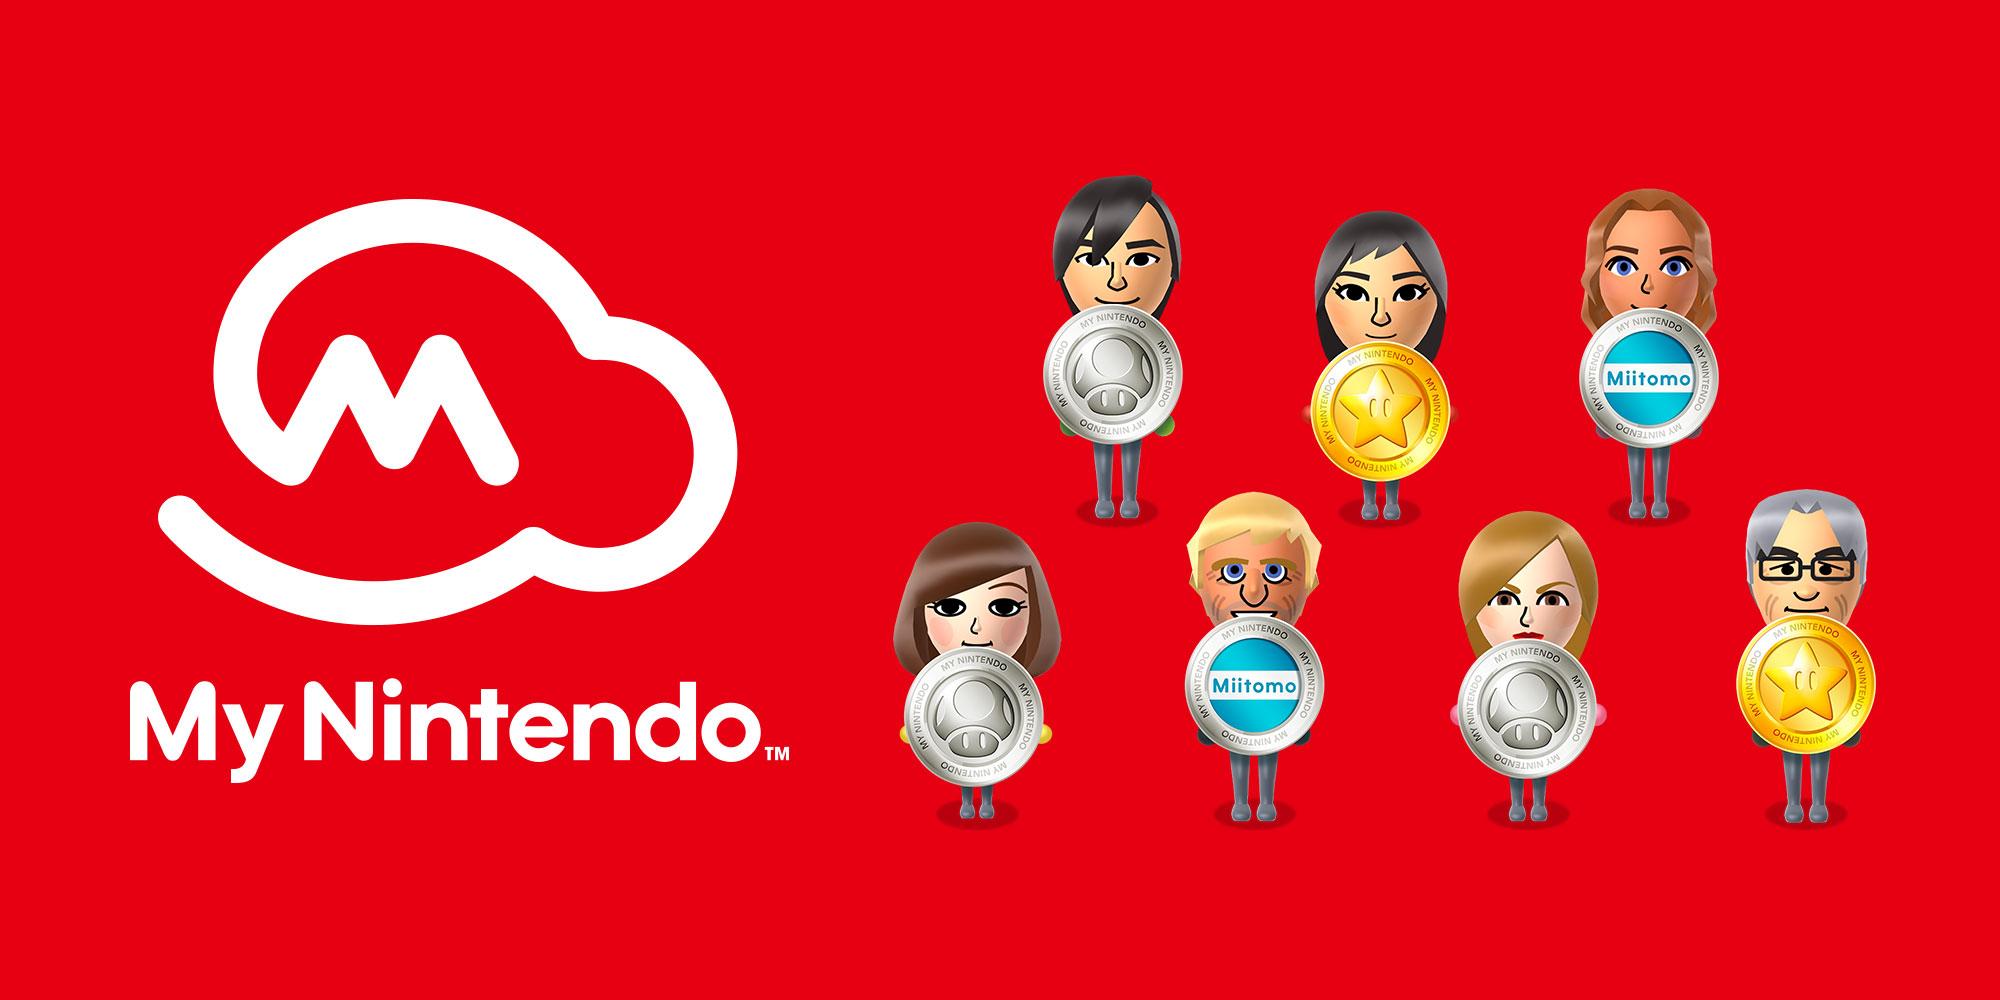 My Nintendo rewards include games again!